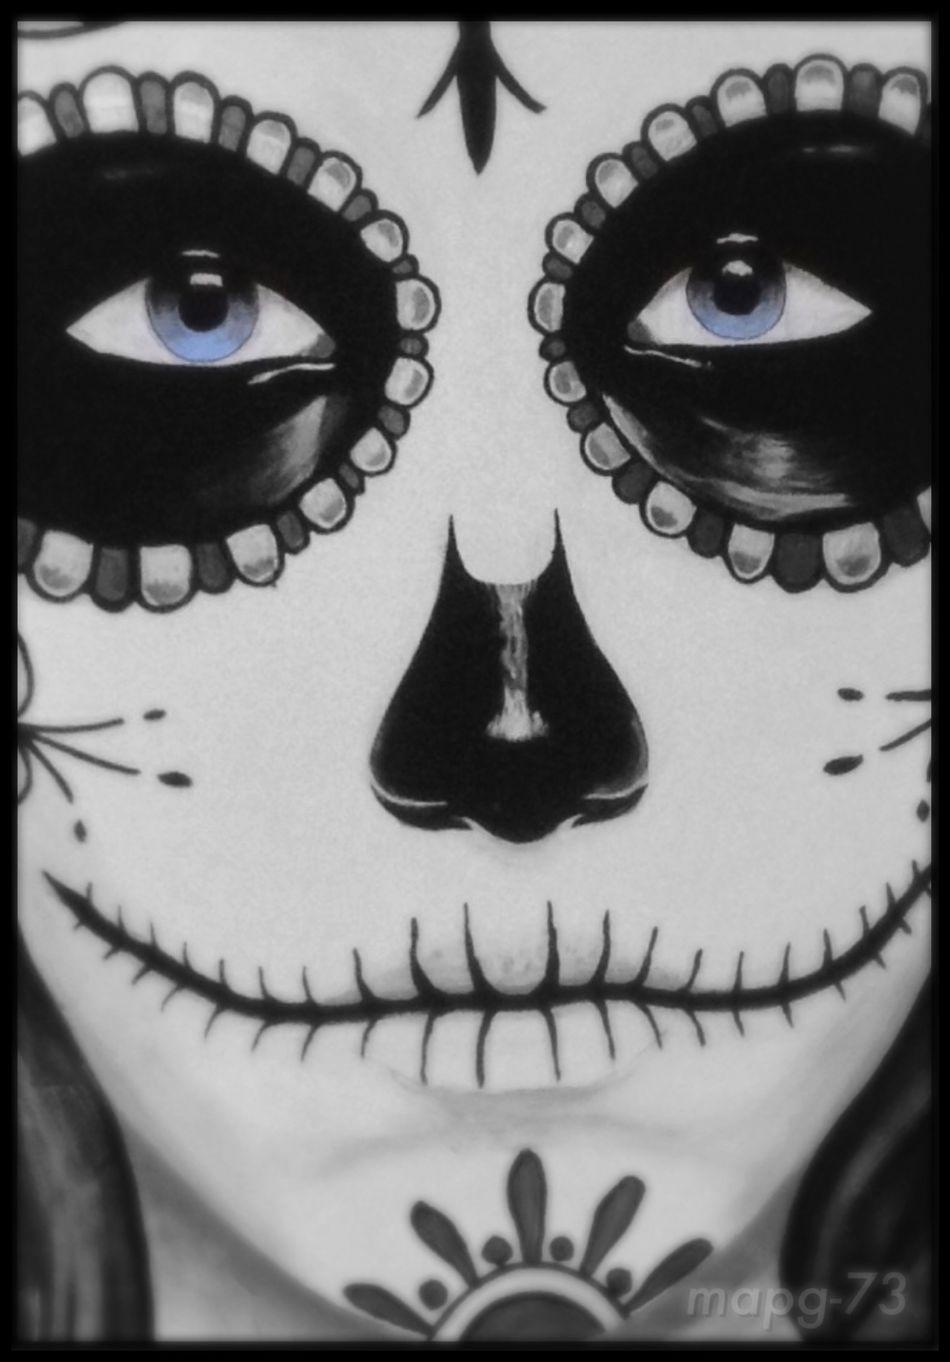 Premium Tgn Working EyeEm Gallery Draw Blackandwhite Drawing Art Eyeem Monochrome